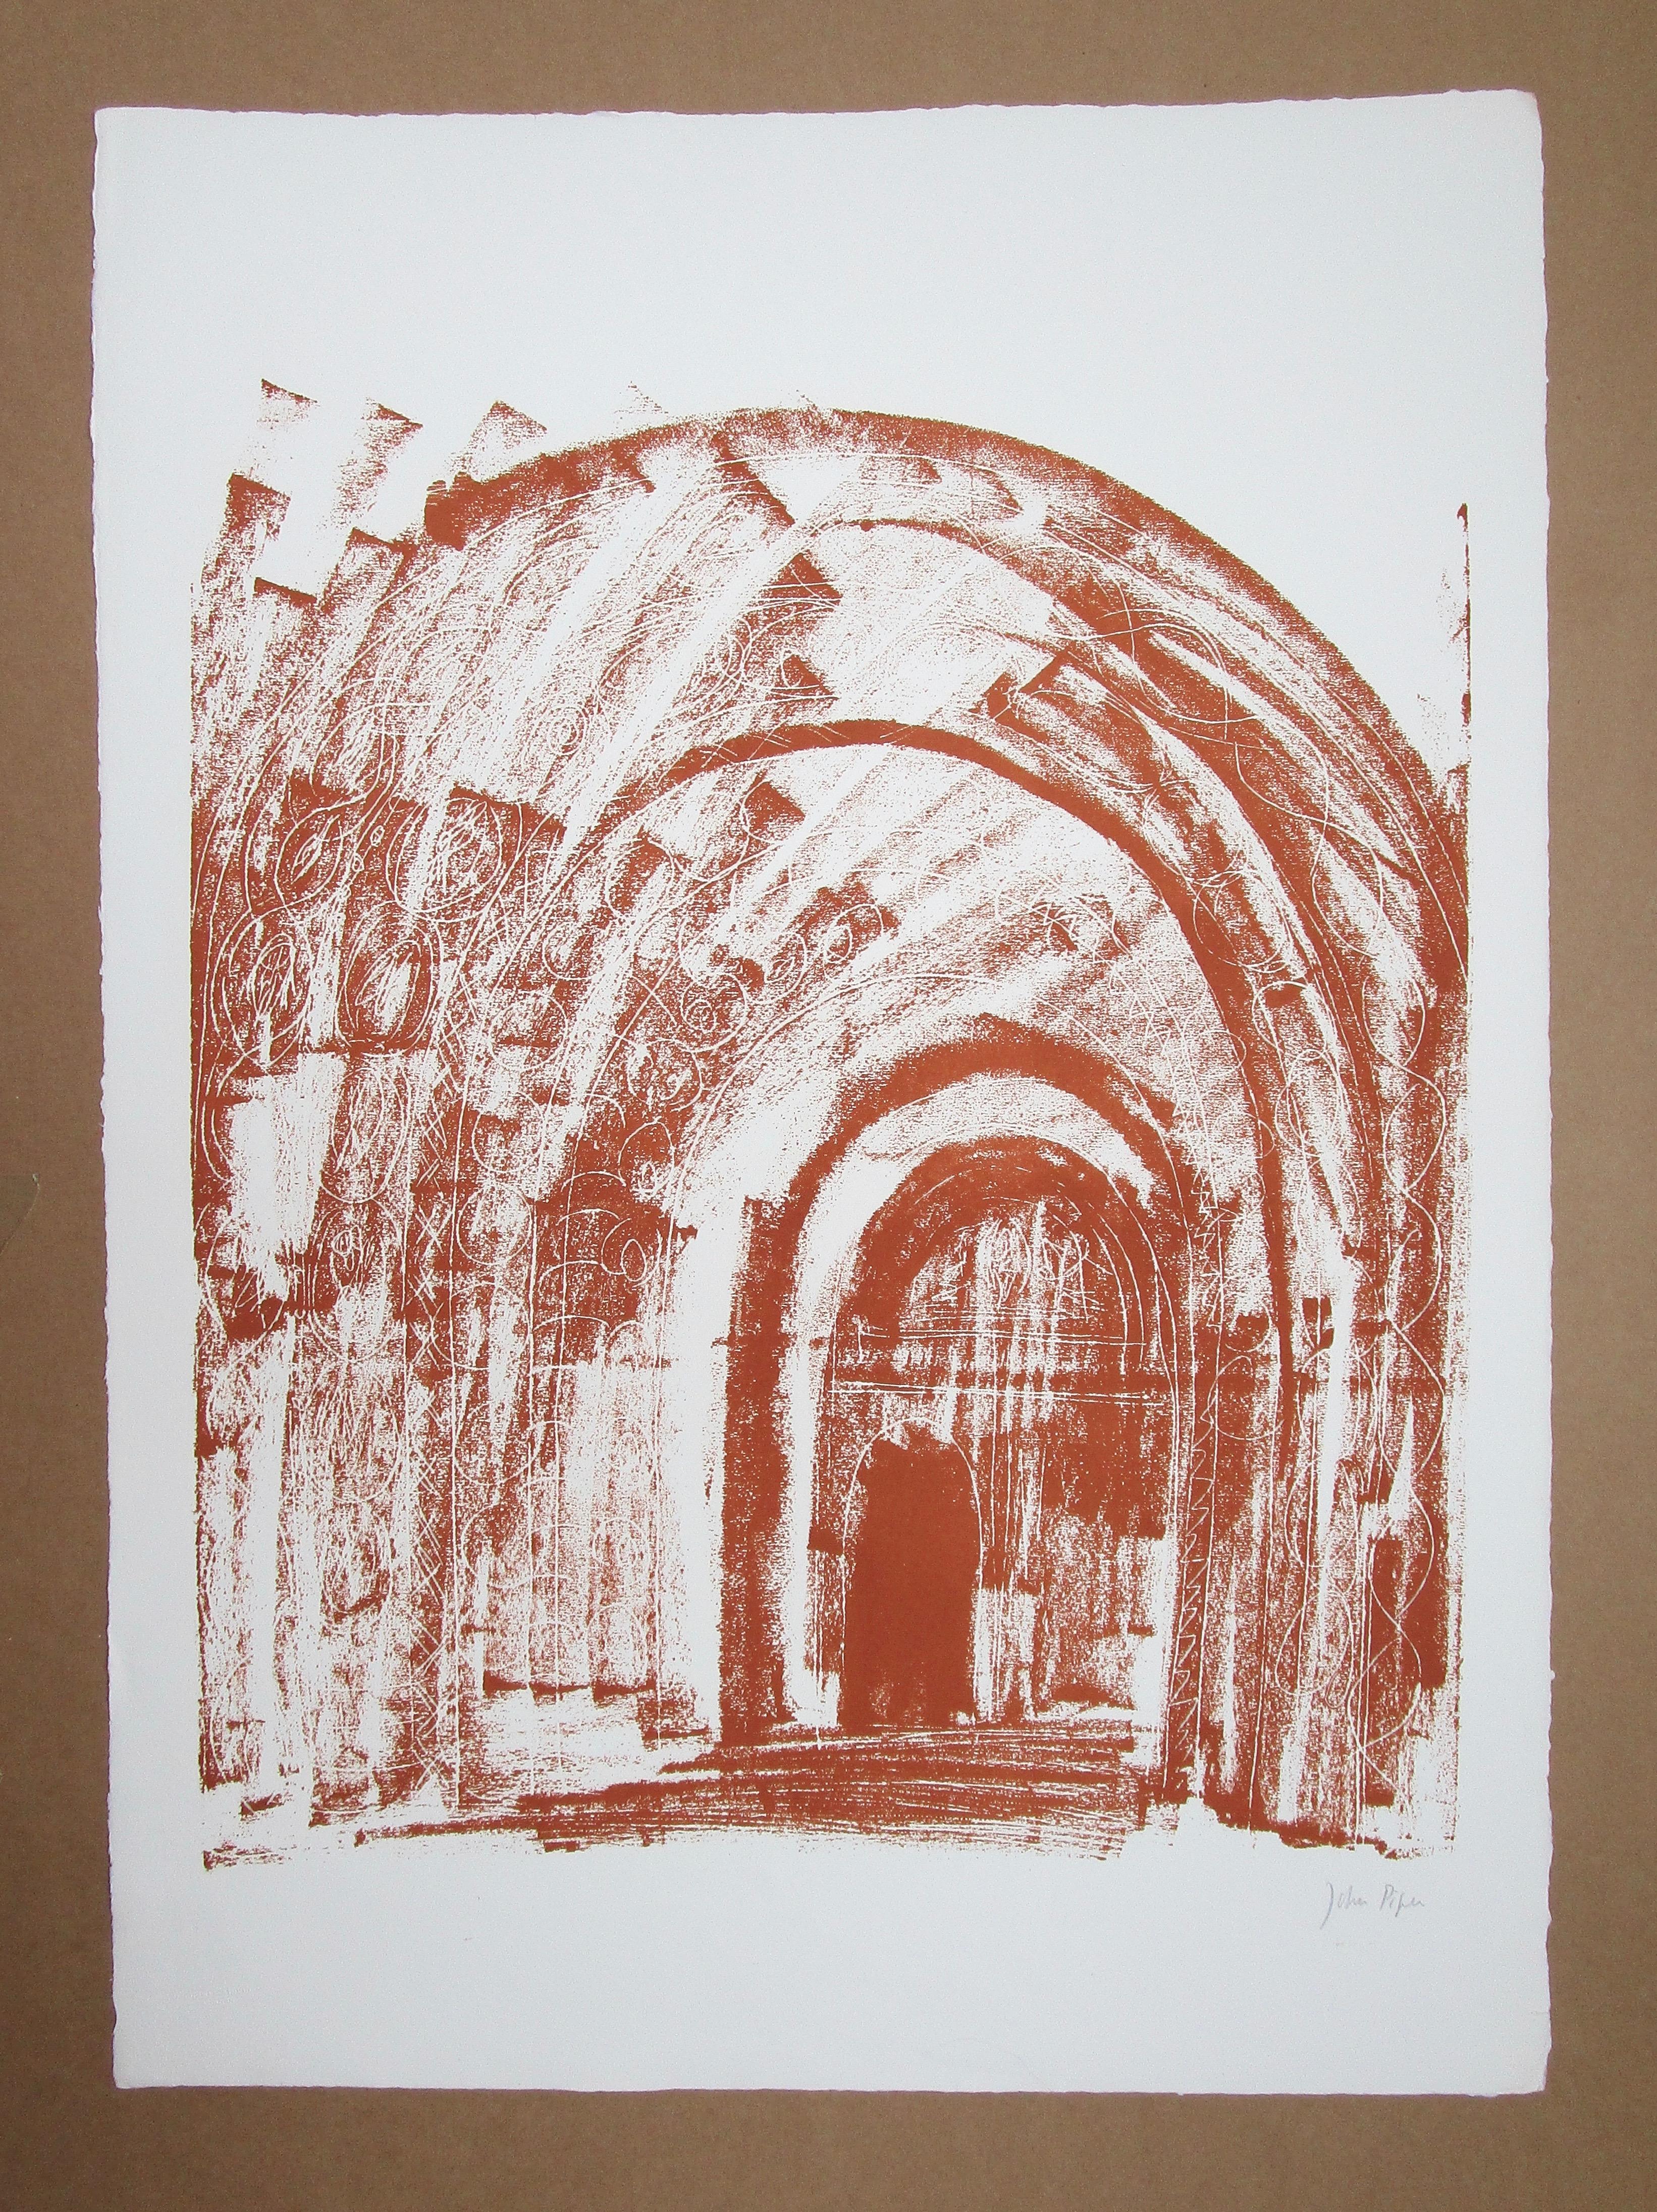 Lot 18 - JOHN PIPER CH [1903-1992] Malmesbury, Wiltshire, 1964.lithograph on handmade Barcham Green paper,